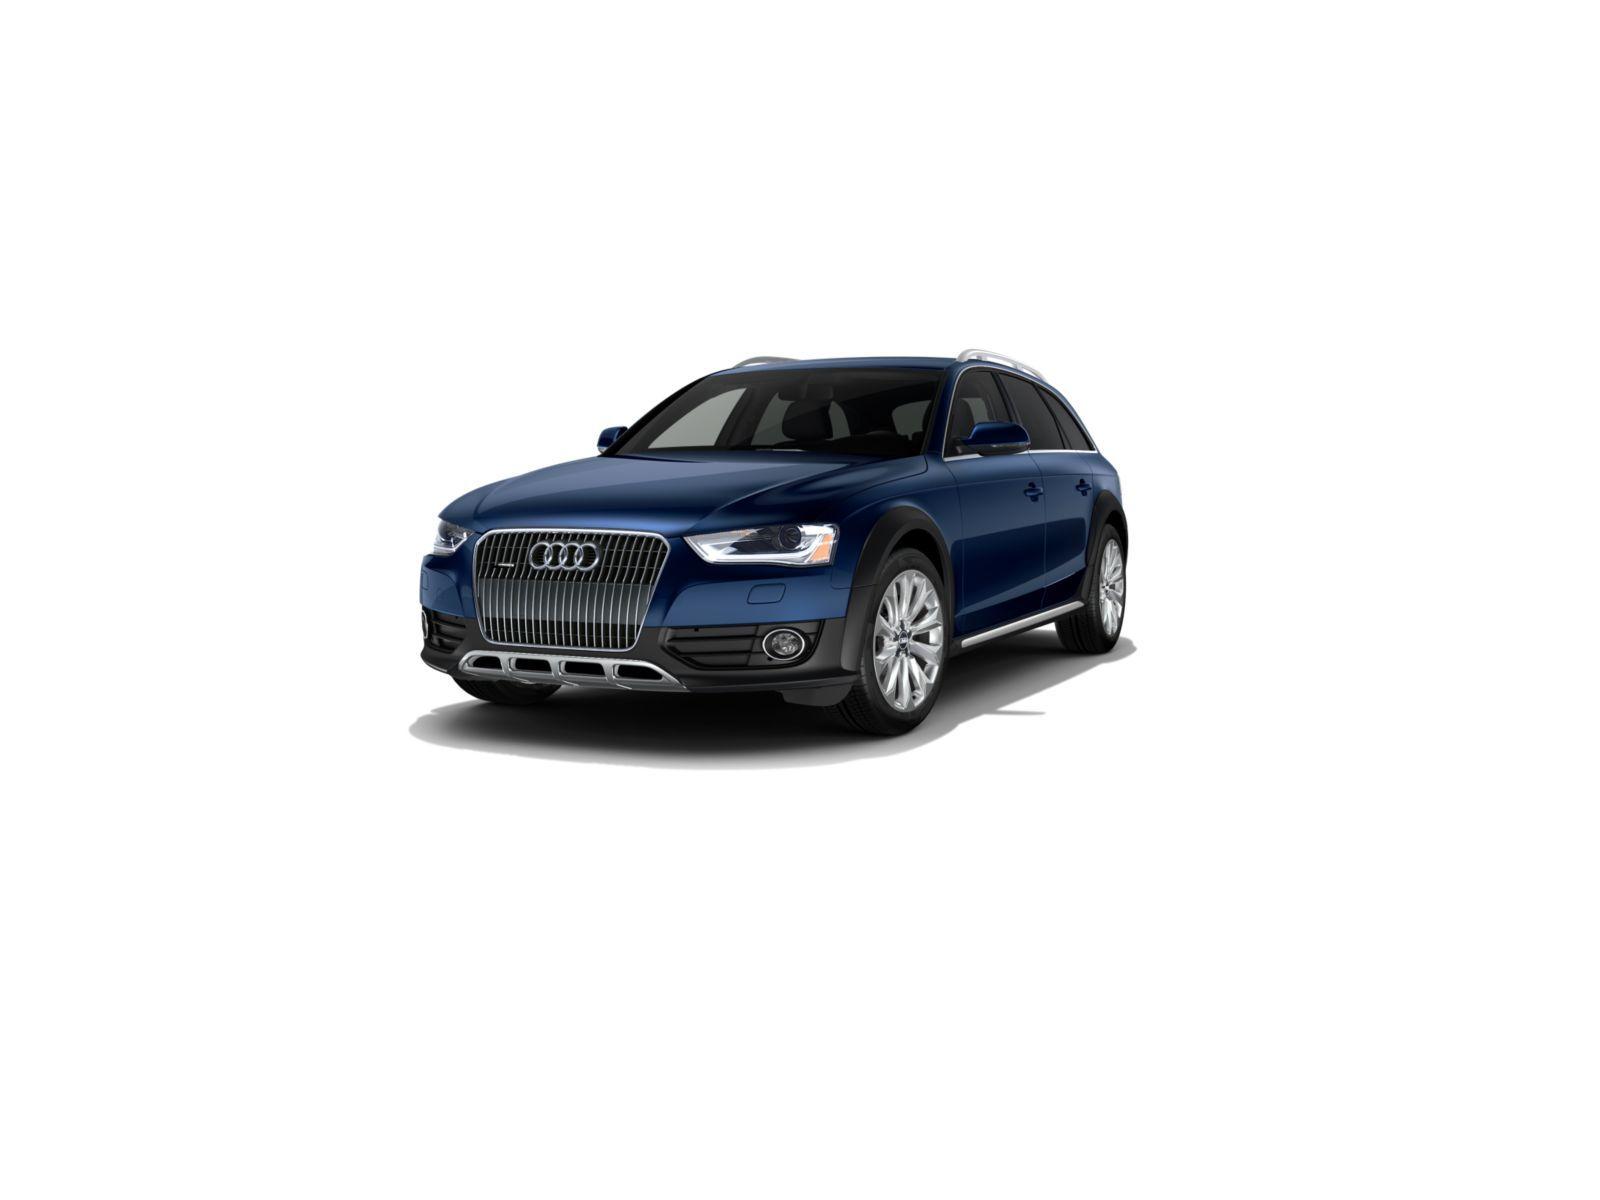 Build Your Own Audi Allroad Car Configurator Audi USA Cars - Audi usa models